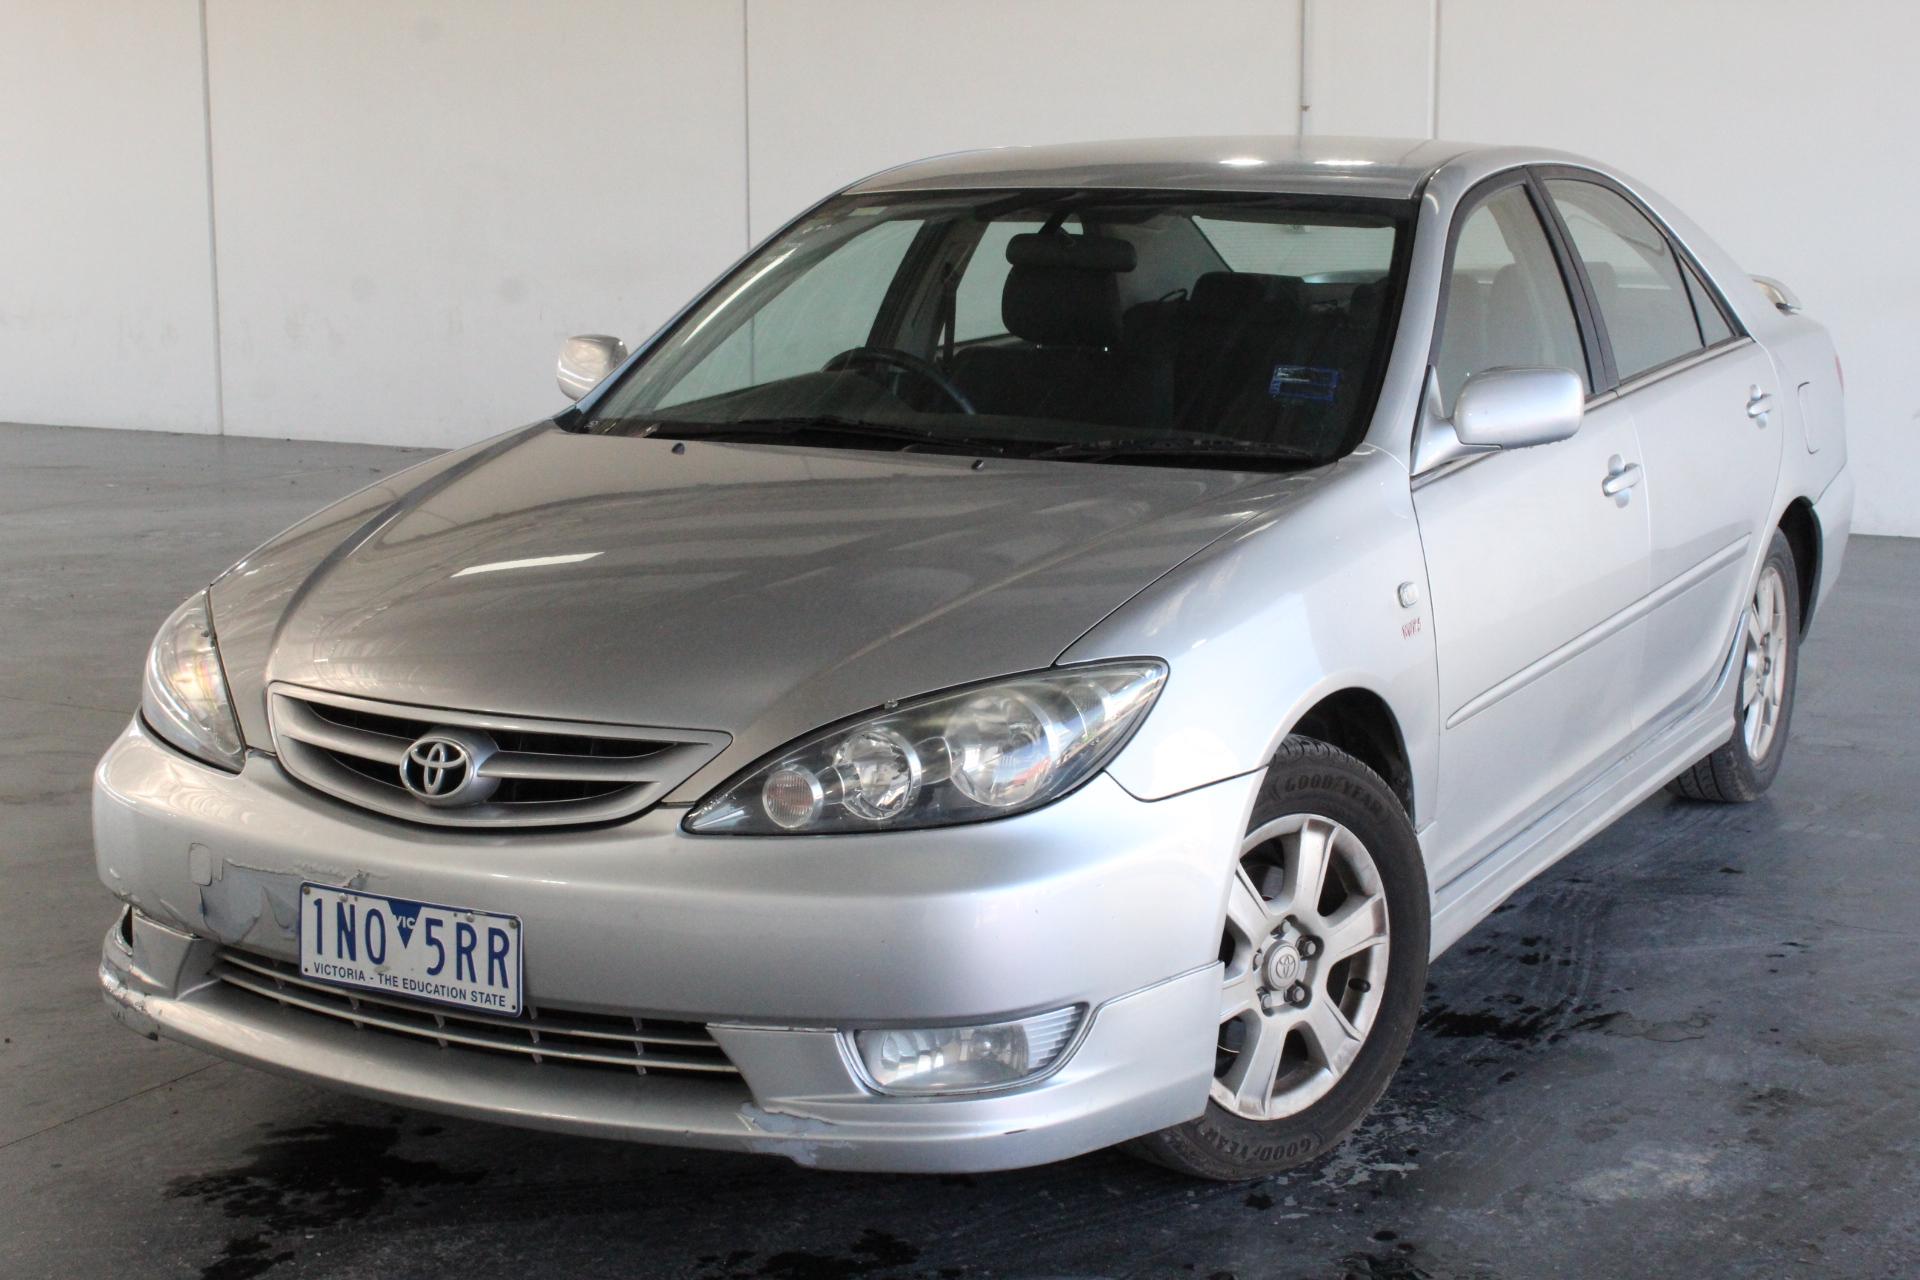 2004 Toyota Camry Sportivo ACV36R Automatic Sedan